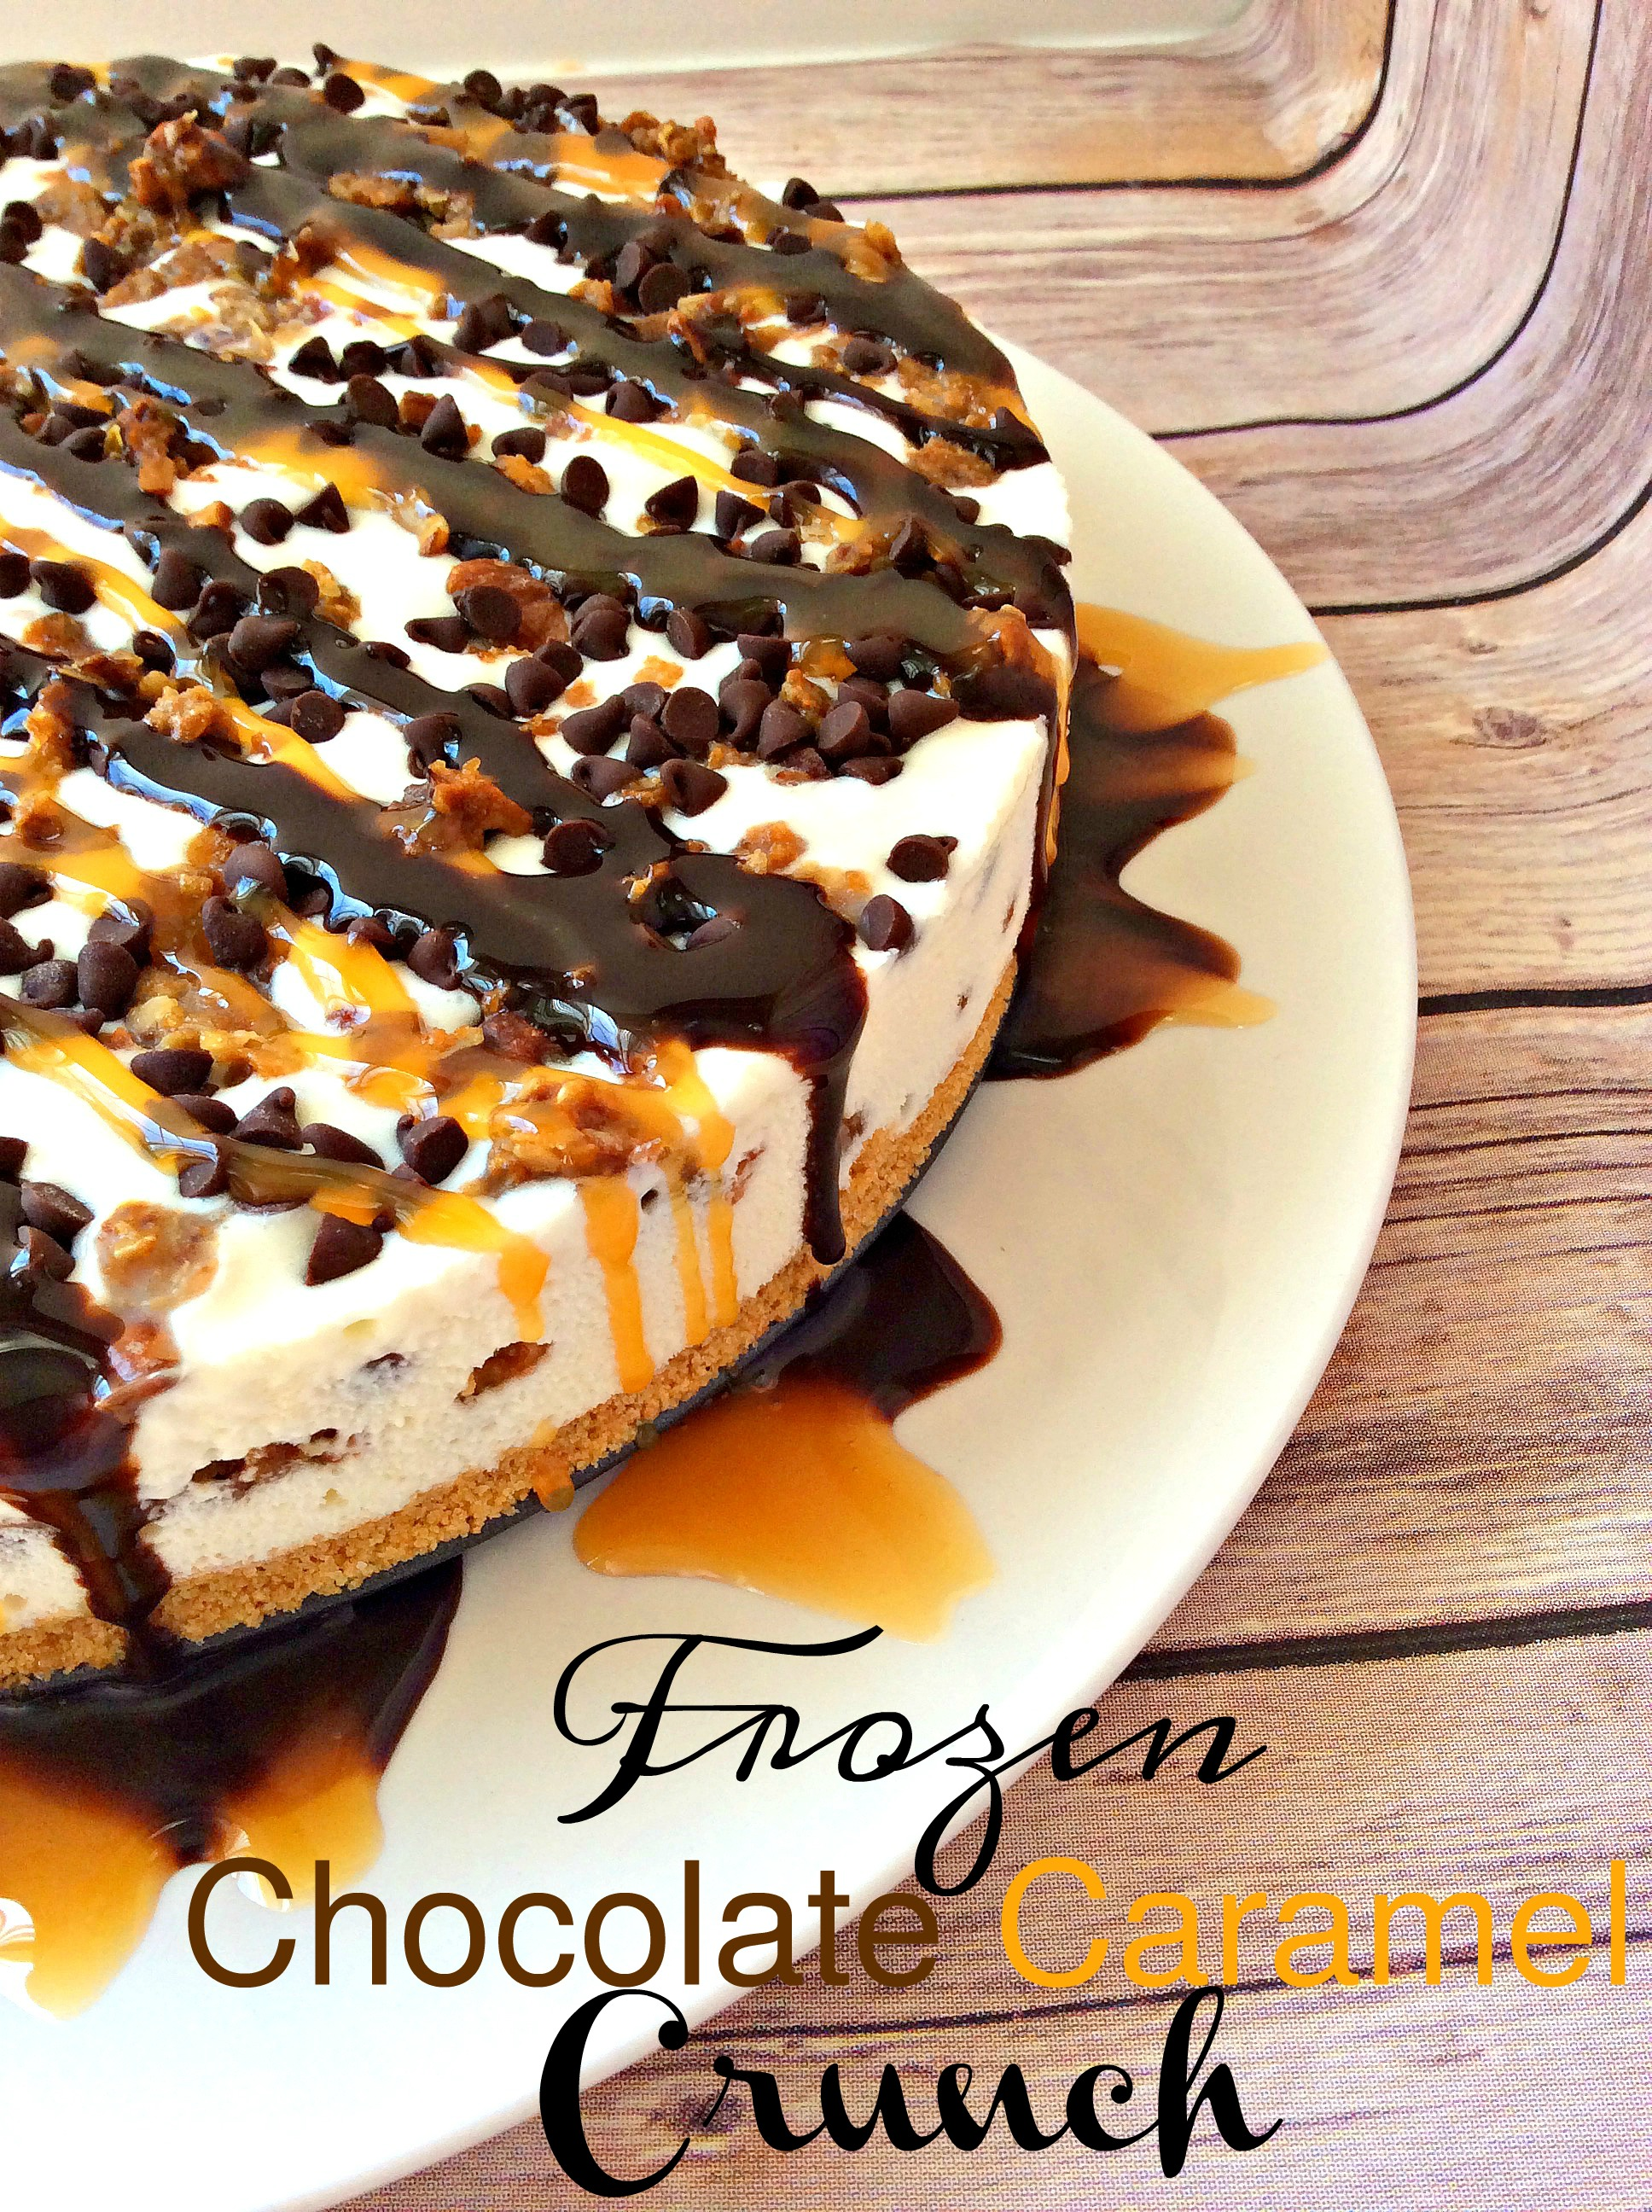 frozen-chocolate-caramel-crunch1